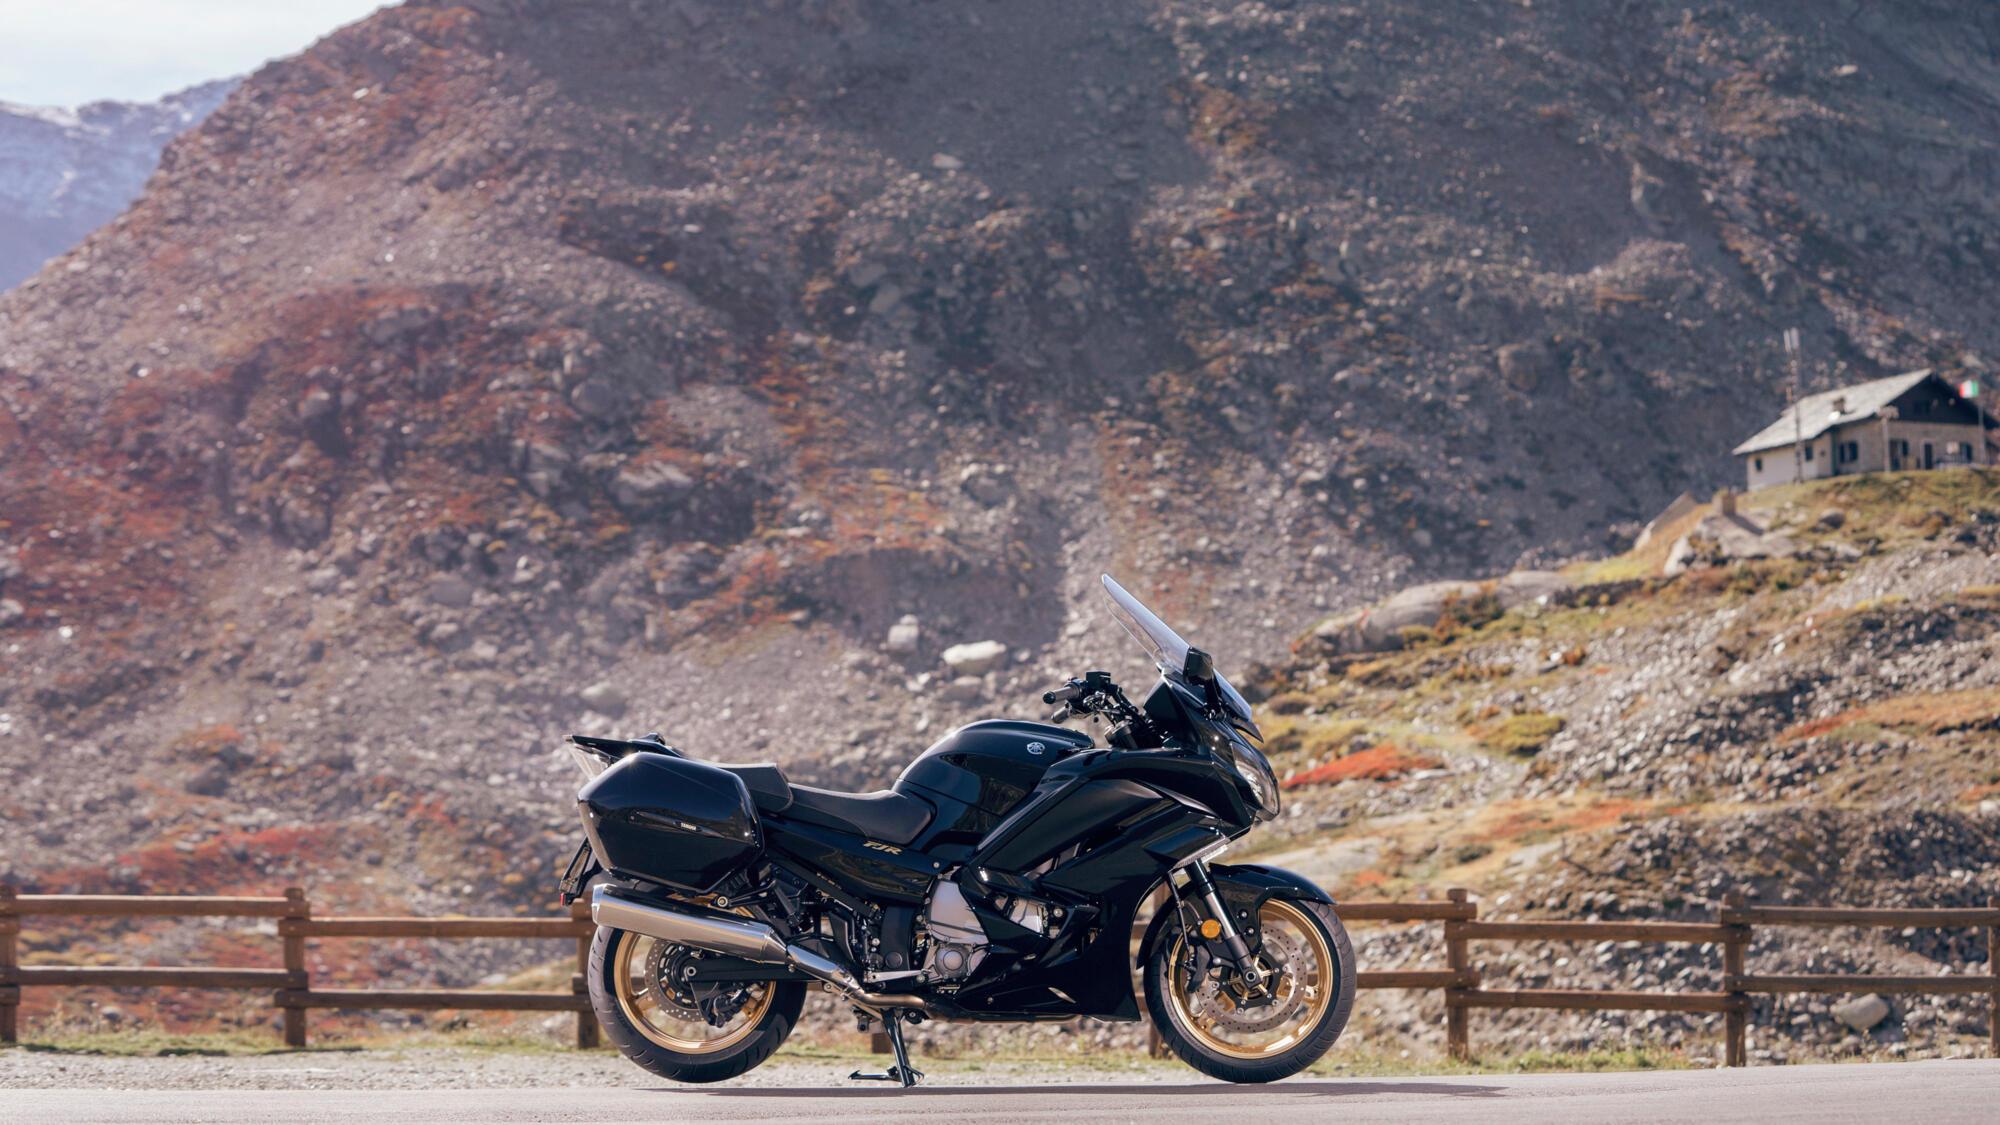 2020-Yamaha-FJR1300ASSPL-EU-Midnight_Black-Static-002-03.jpg